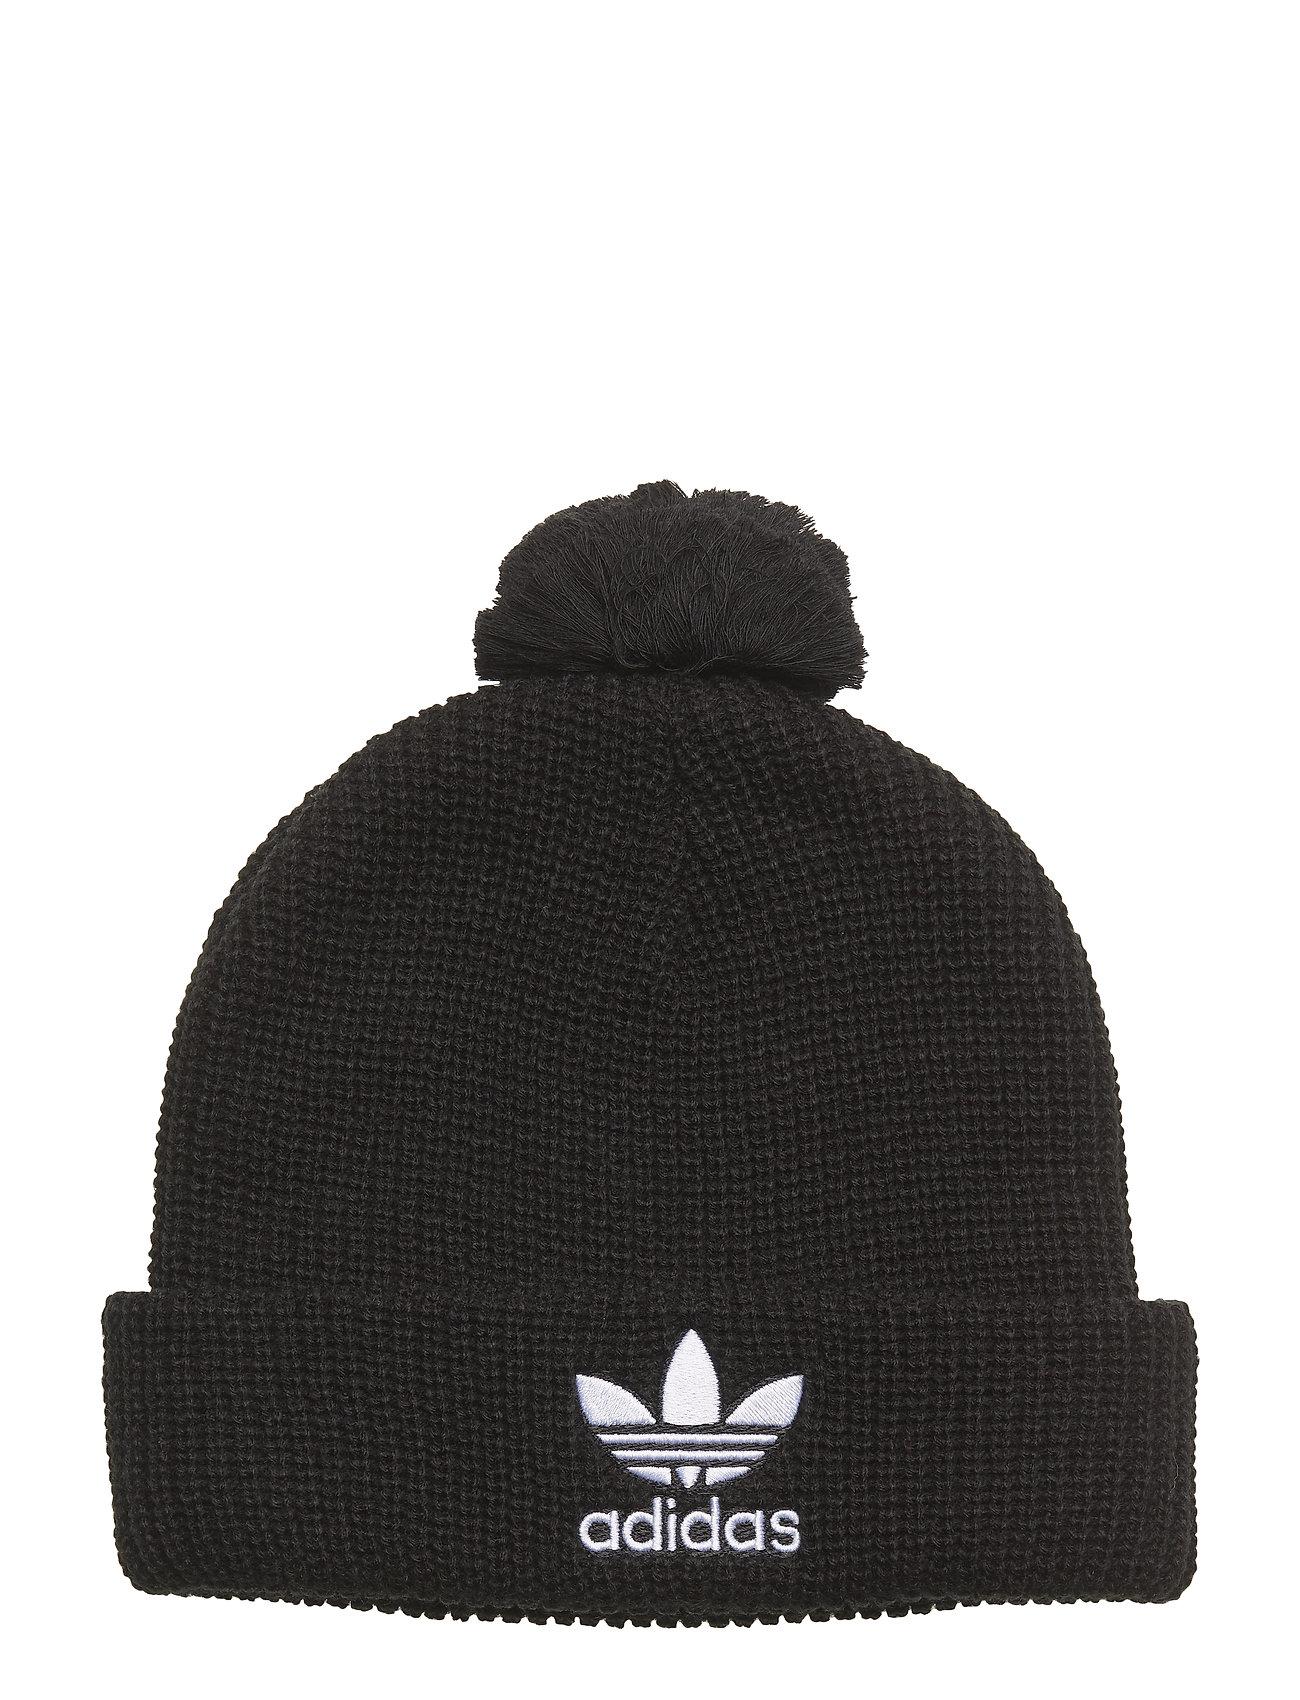 3cf3d11b9ad adidas Originals Pom Pom Beanie (Black), 109 kr | Stort udvalg af ...